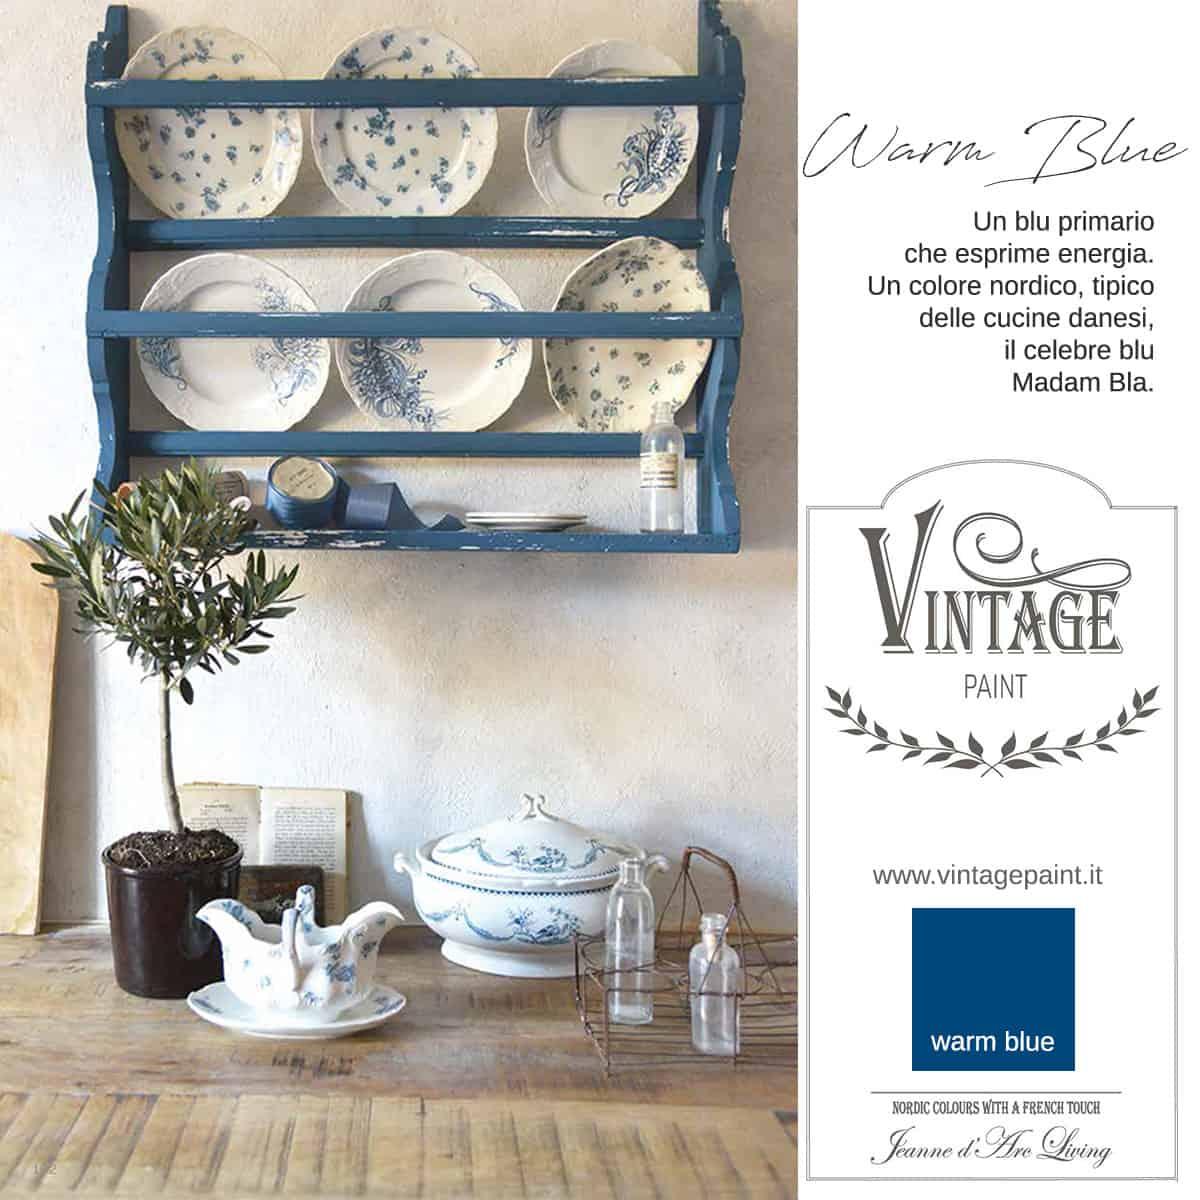 warm blue blu vintage chalk paint vernici shabby chic autentico look gesso